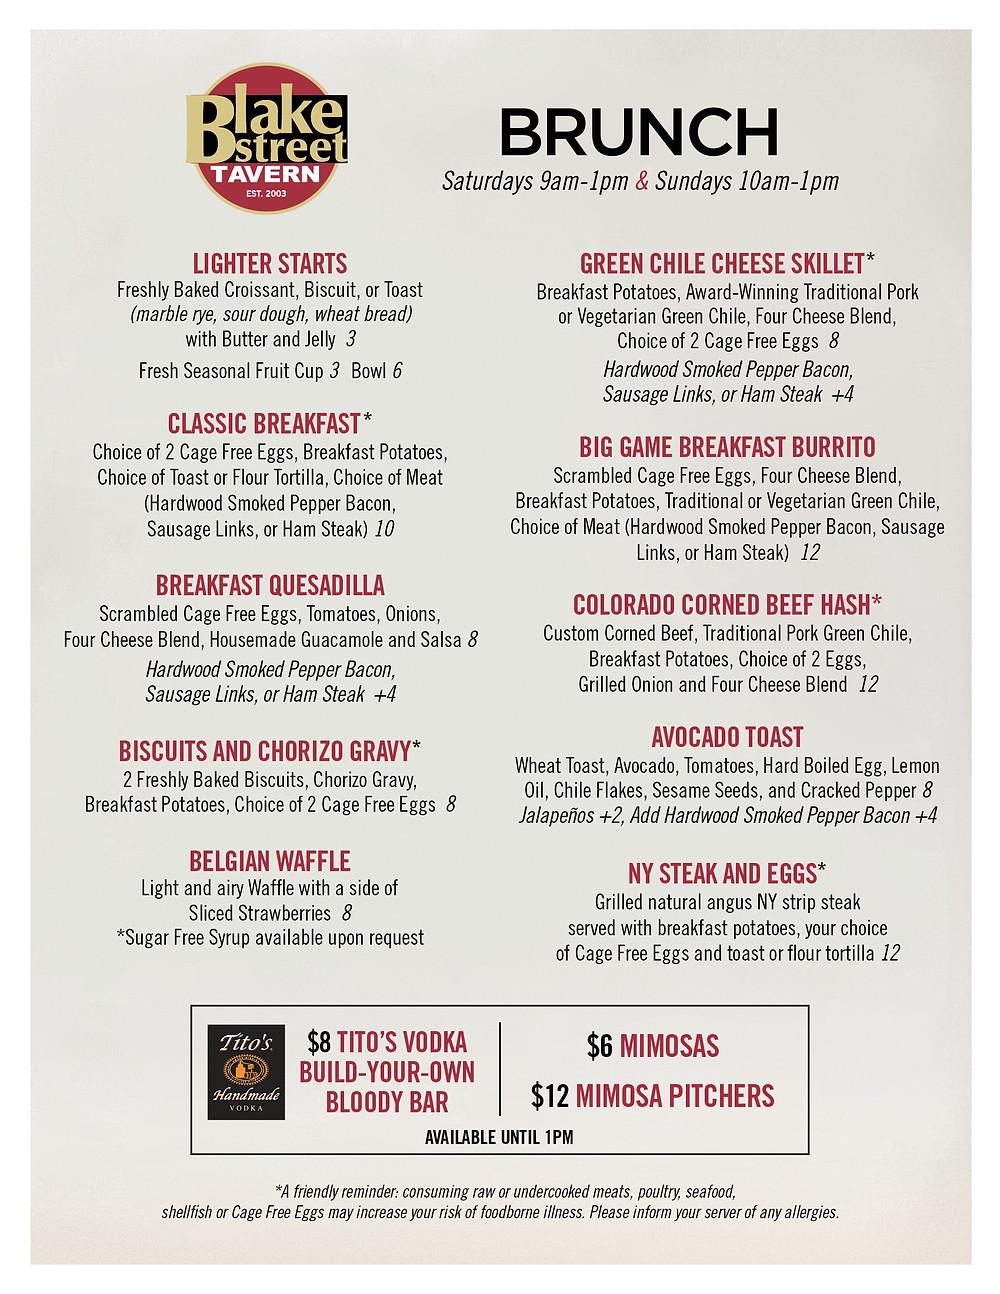 Best Breakfast in Downtown Denver - Blake Street Tavern Breakfast Menu